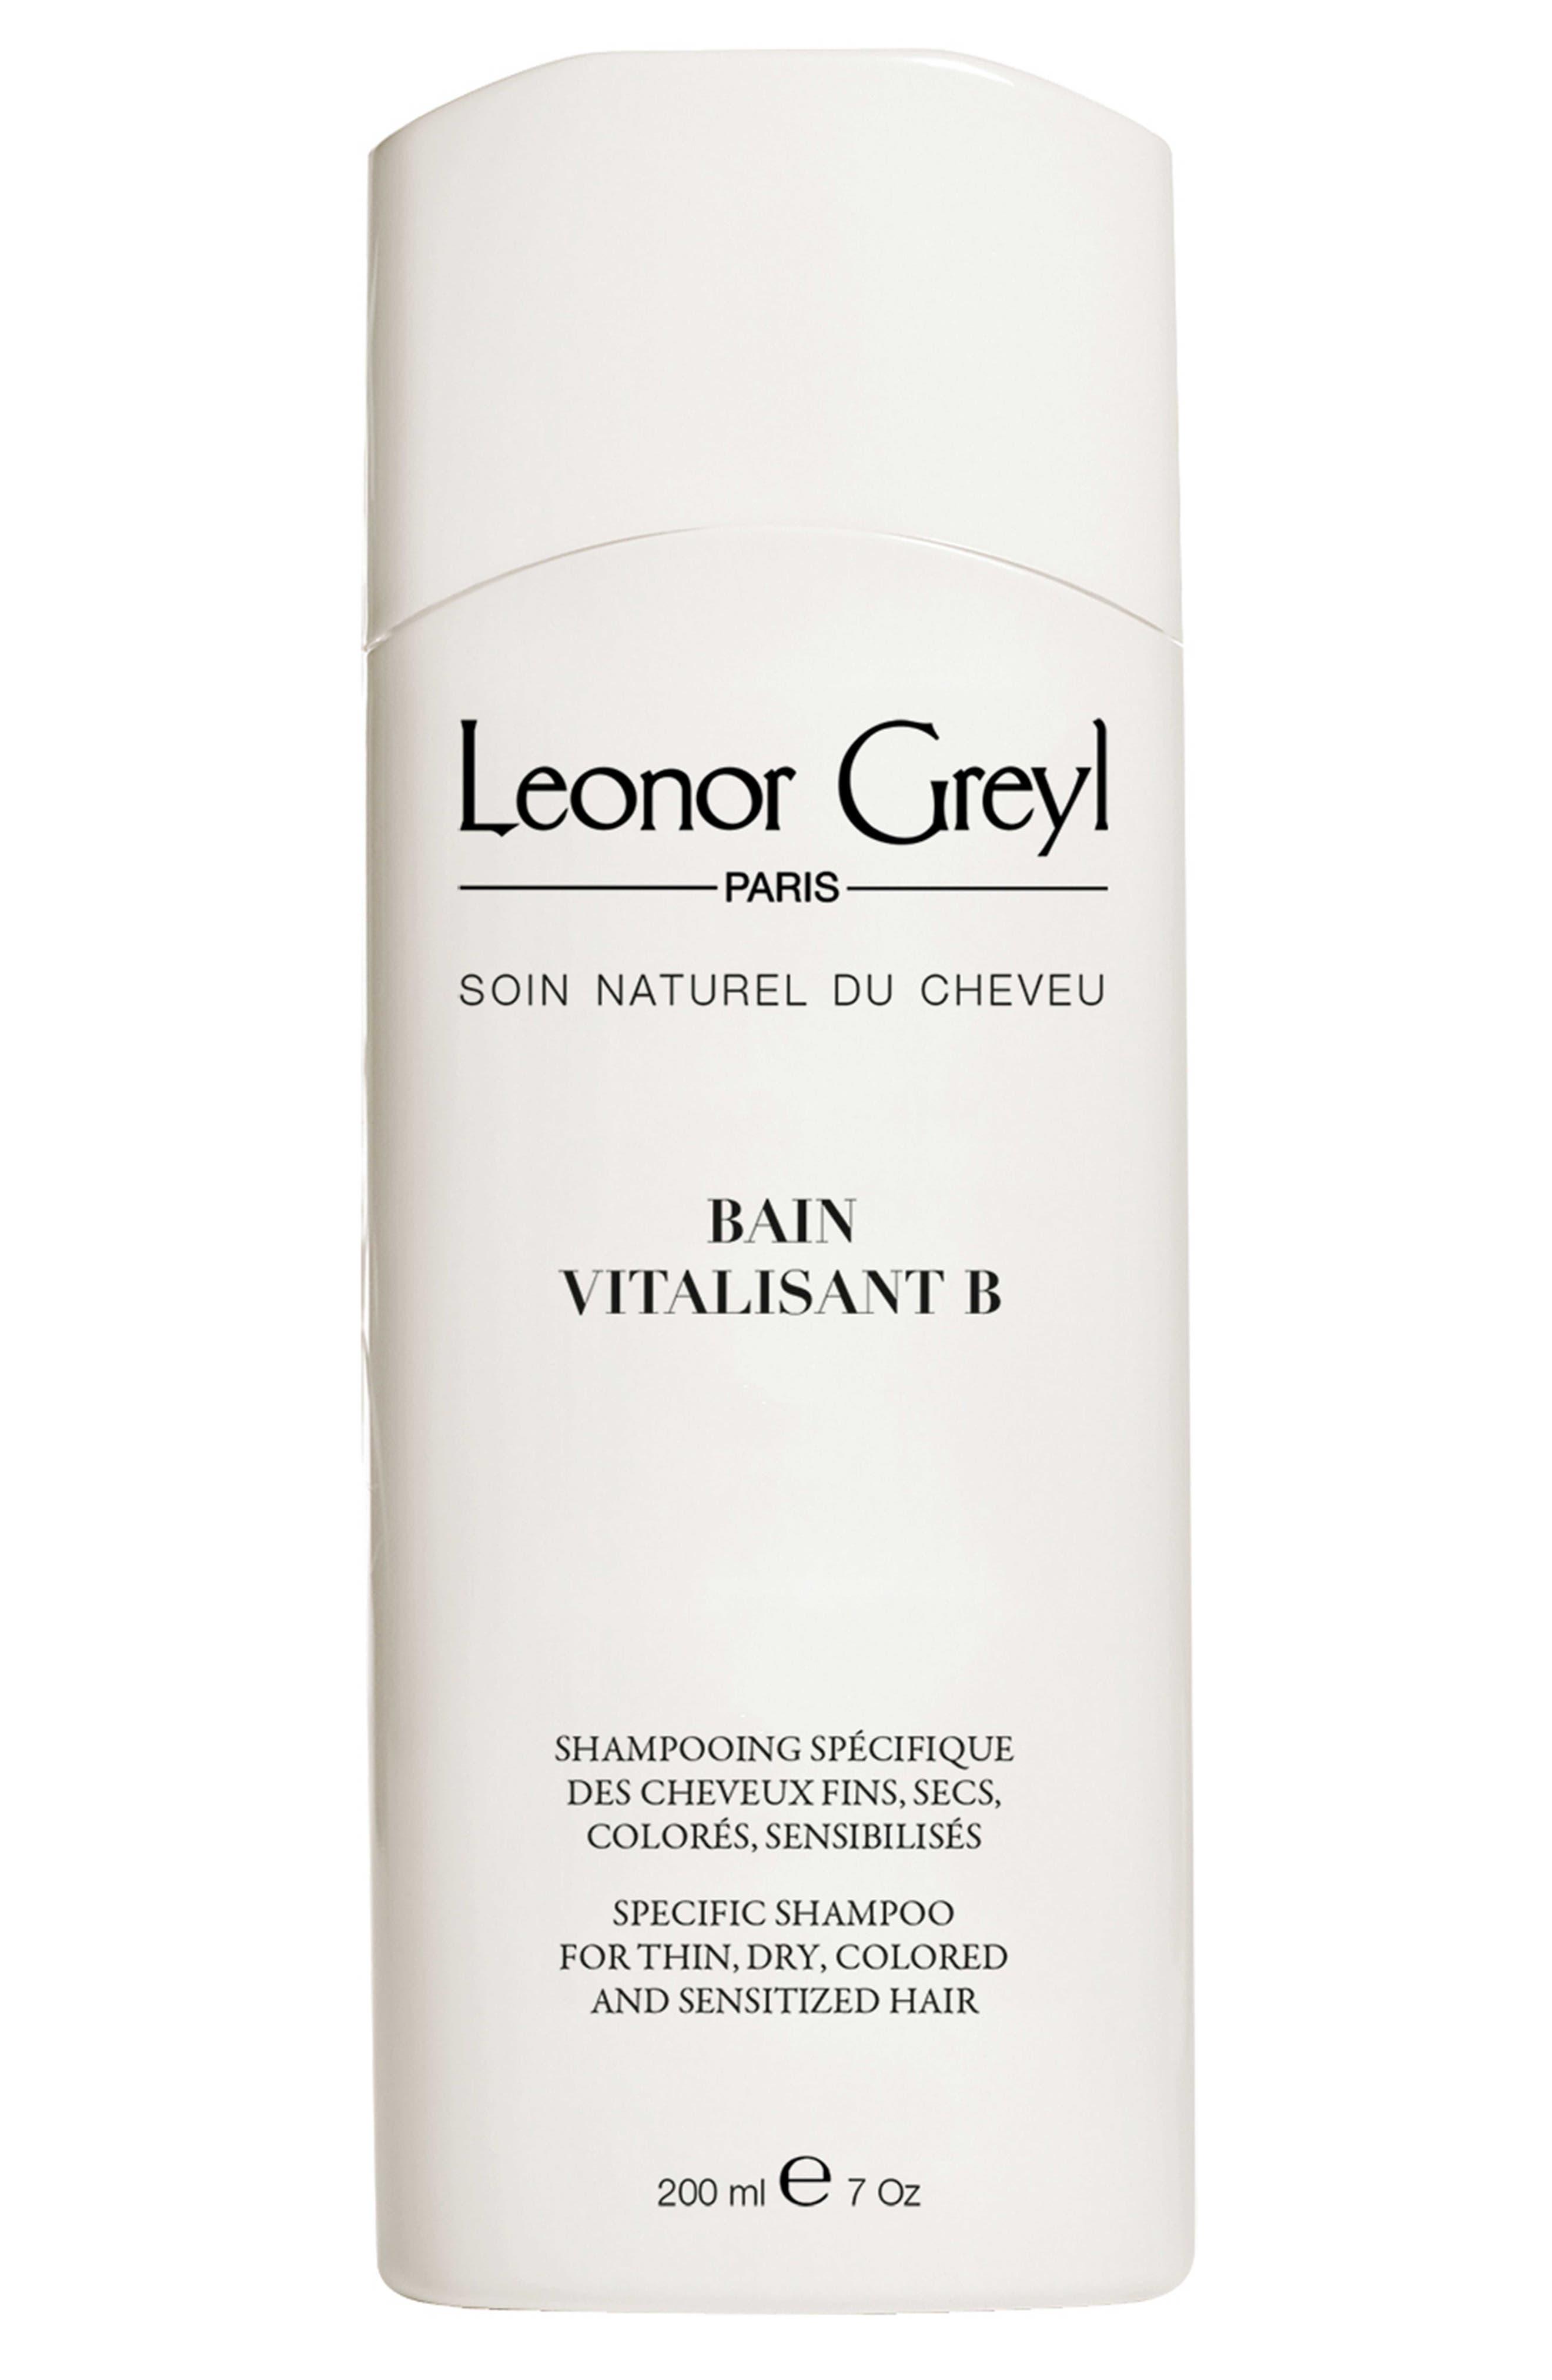 LEONOR GREYL Bain Vitalisant B (Shampoo For Thin, Dry, Colored And Sensitized Hair), 7.0 Oz./ 200 Ml